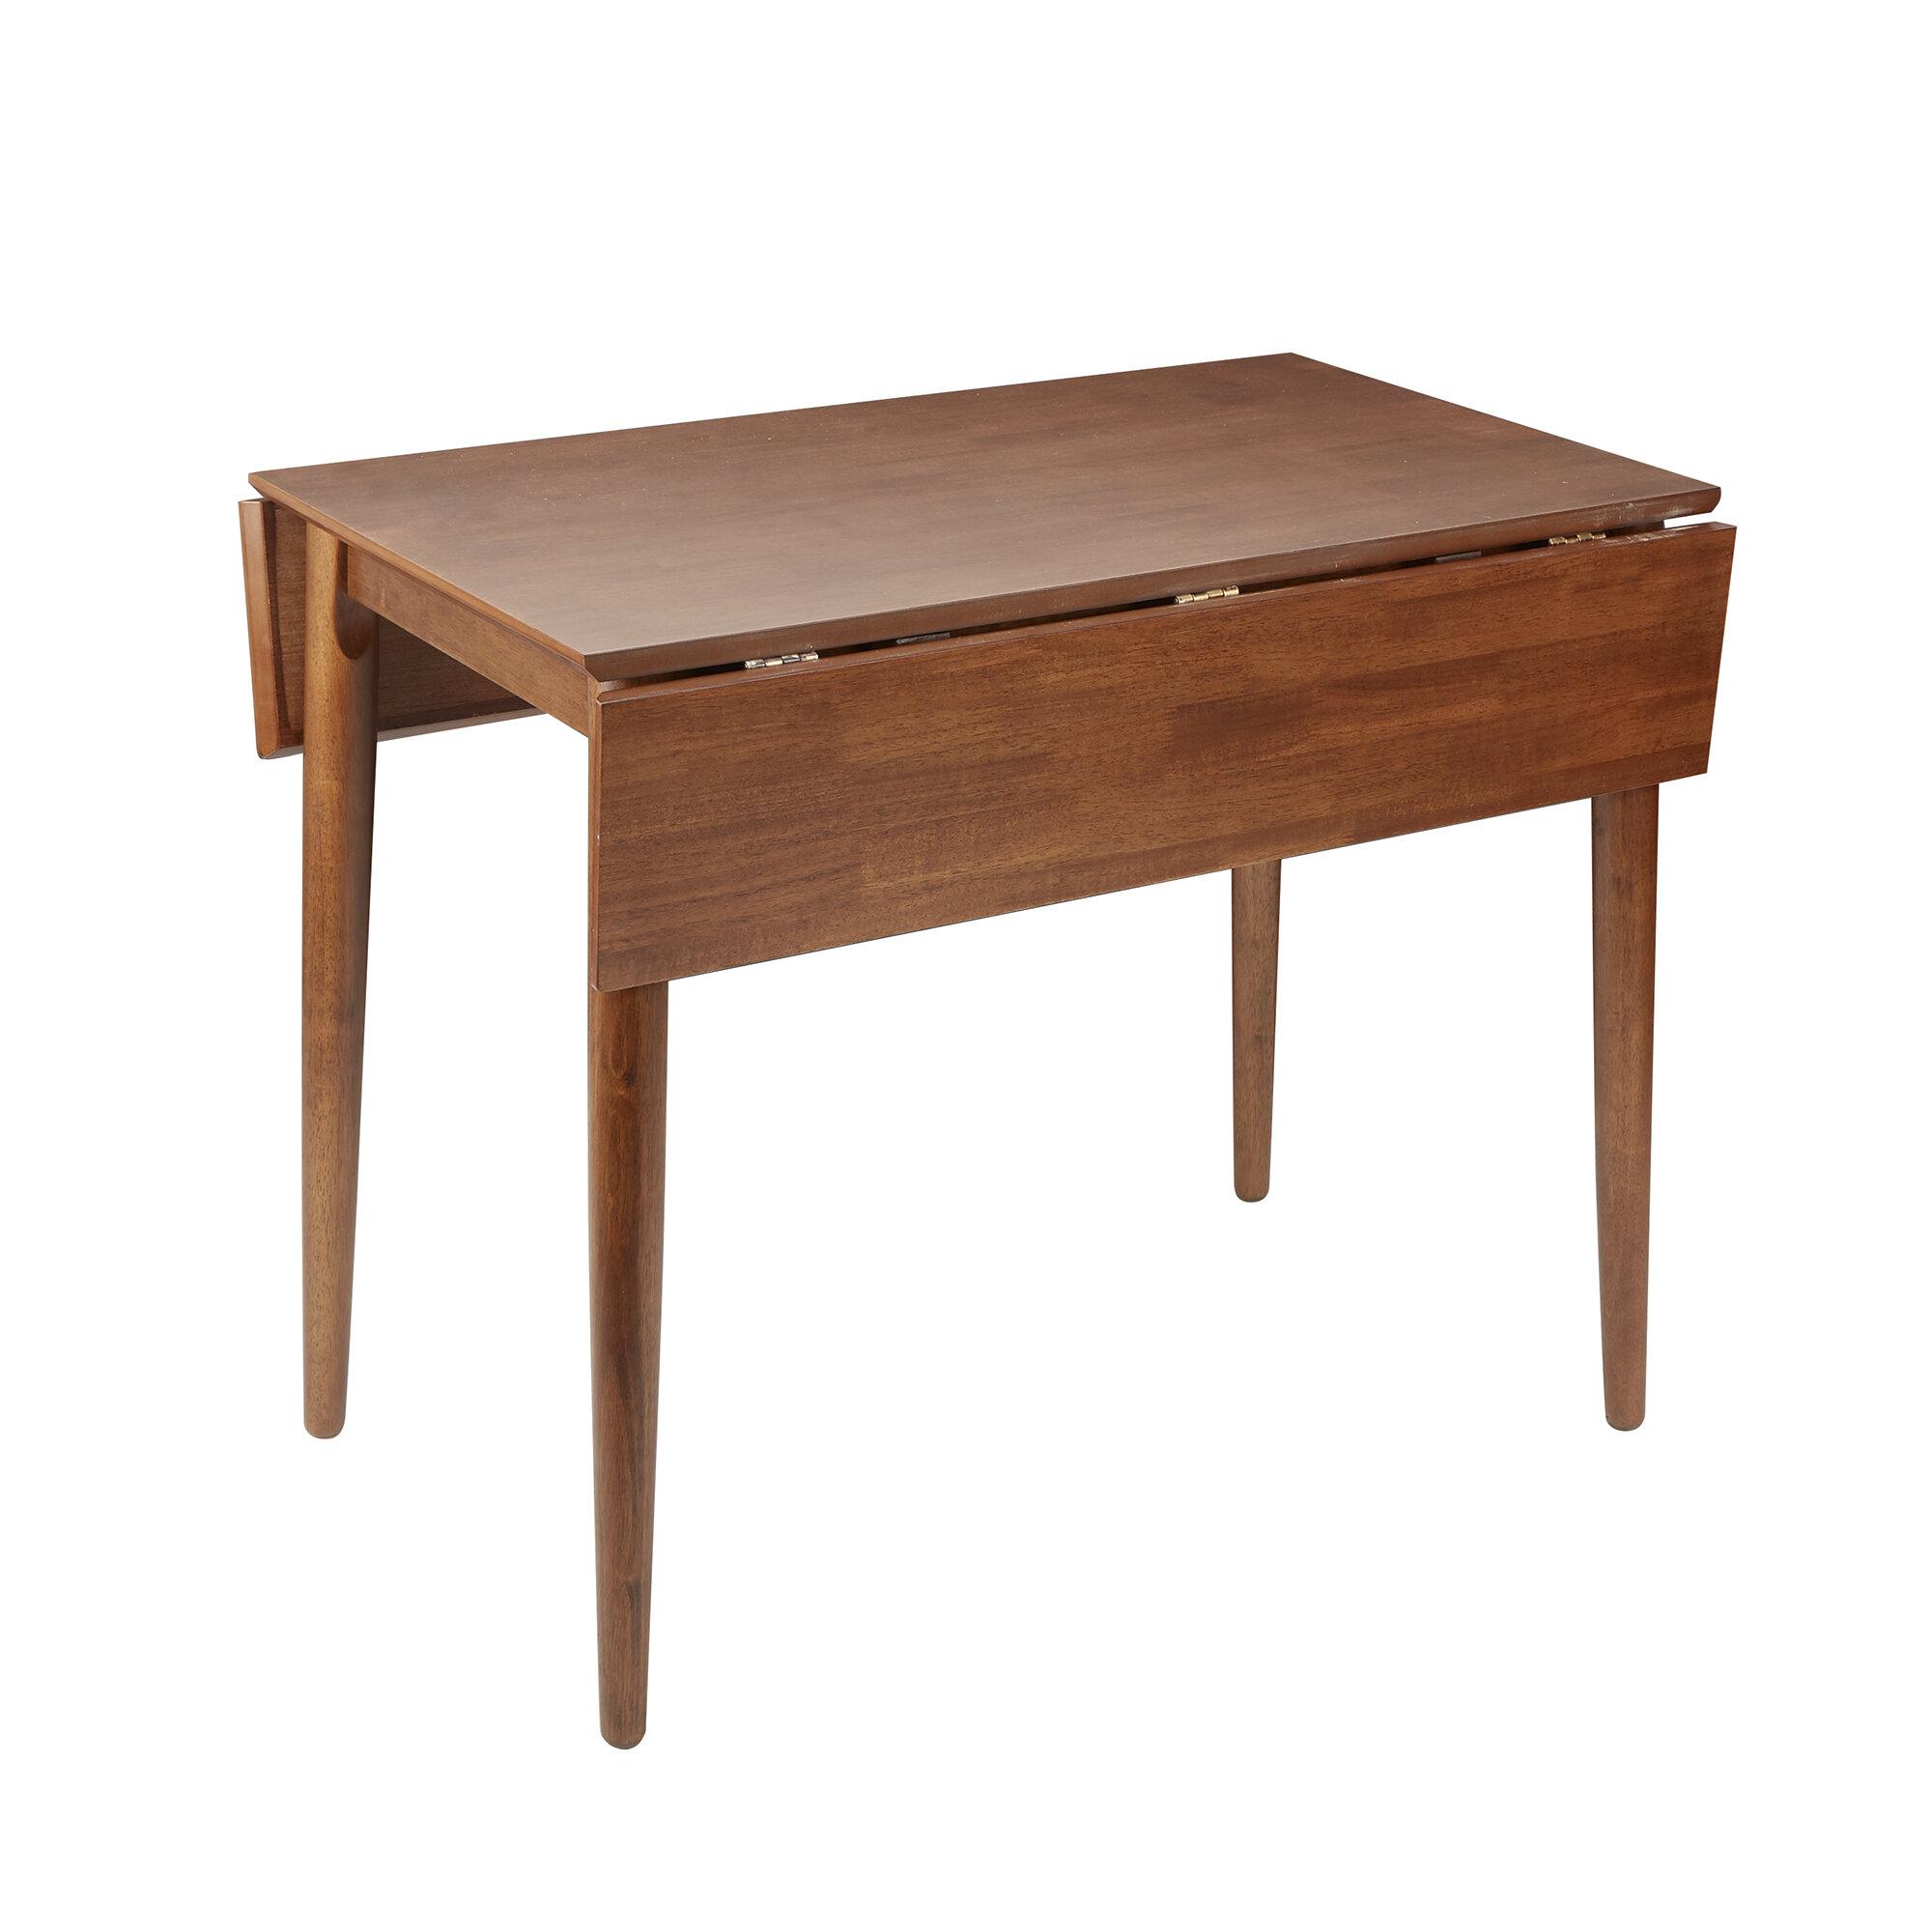 0552f3739e40 Ebern Designs Alidade Mid-Century Modern Drop Leaf Dining Table ...